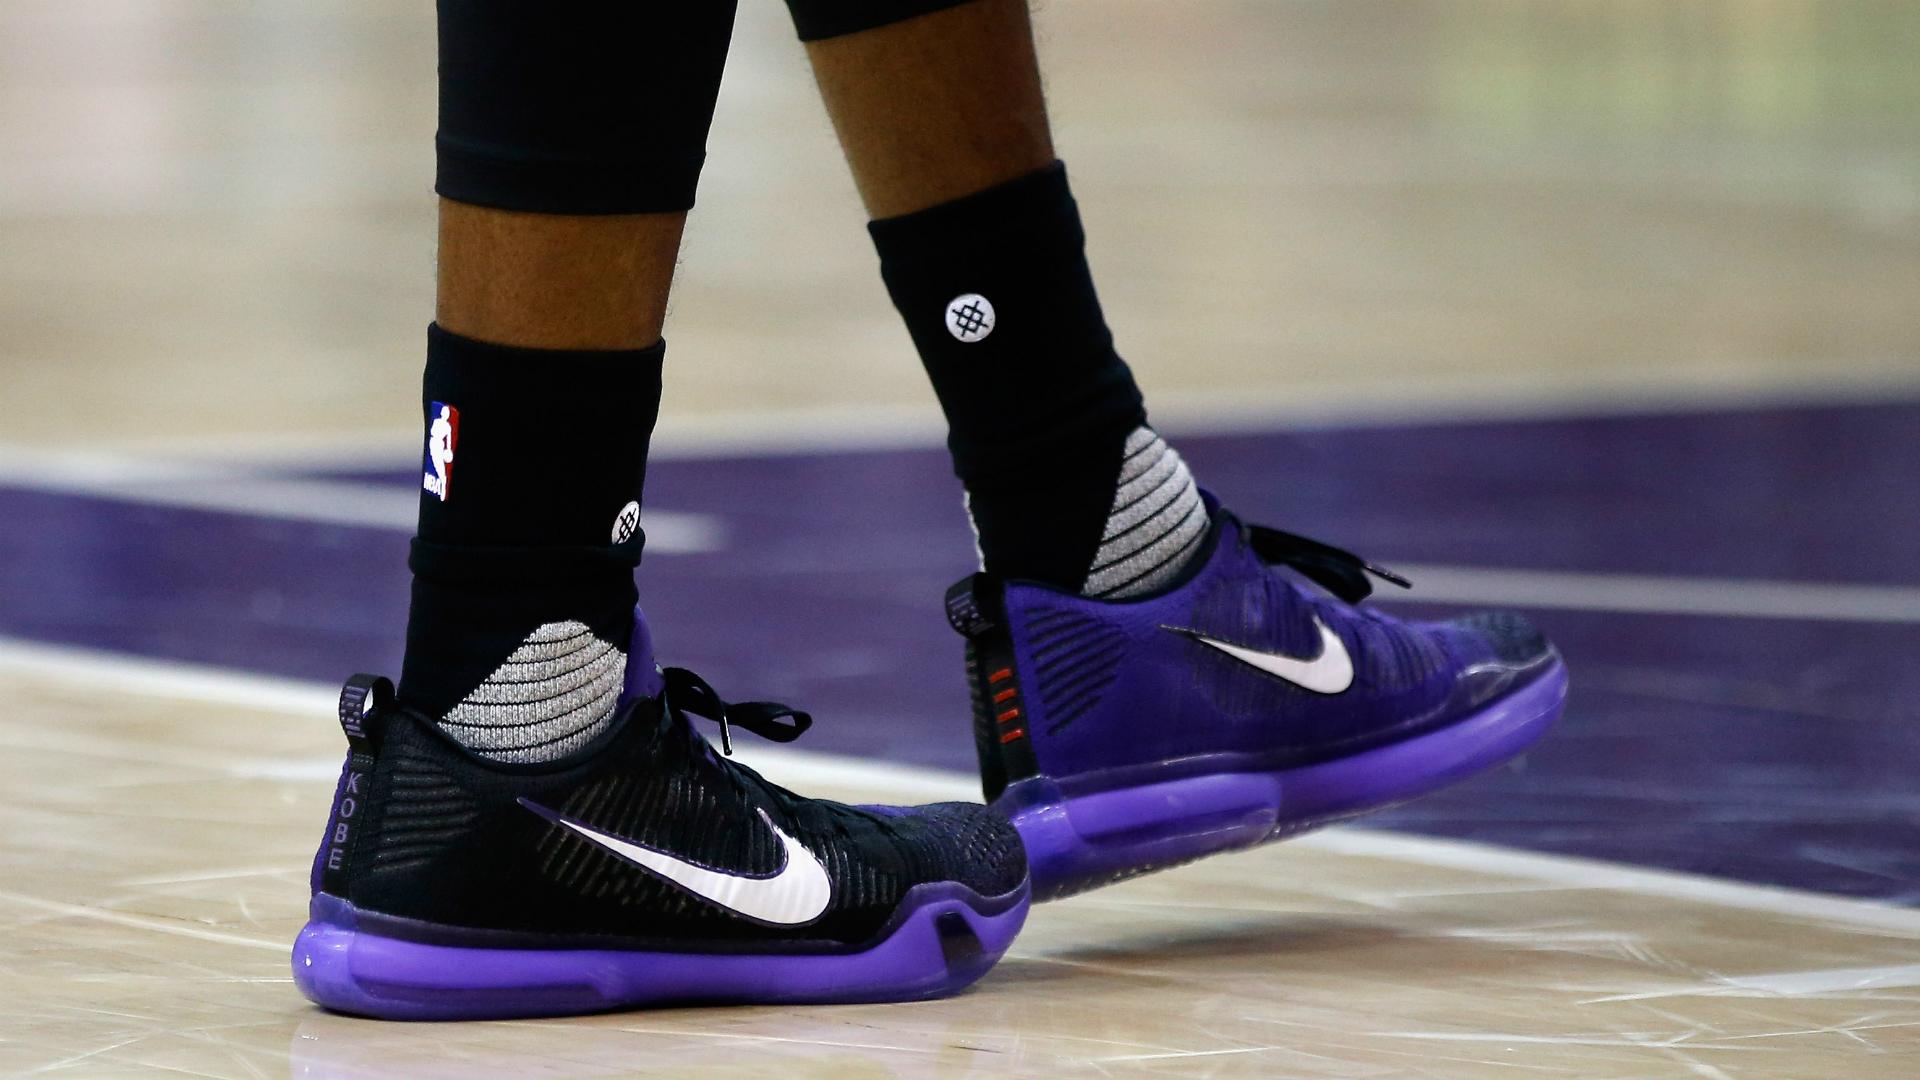 2016 Kobe 11 Basketball Shoes Weavon Low Mens American ...  Nike Kobe Basketball Shoes 2016